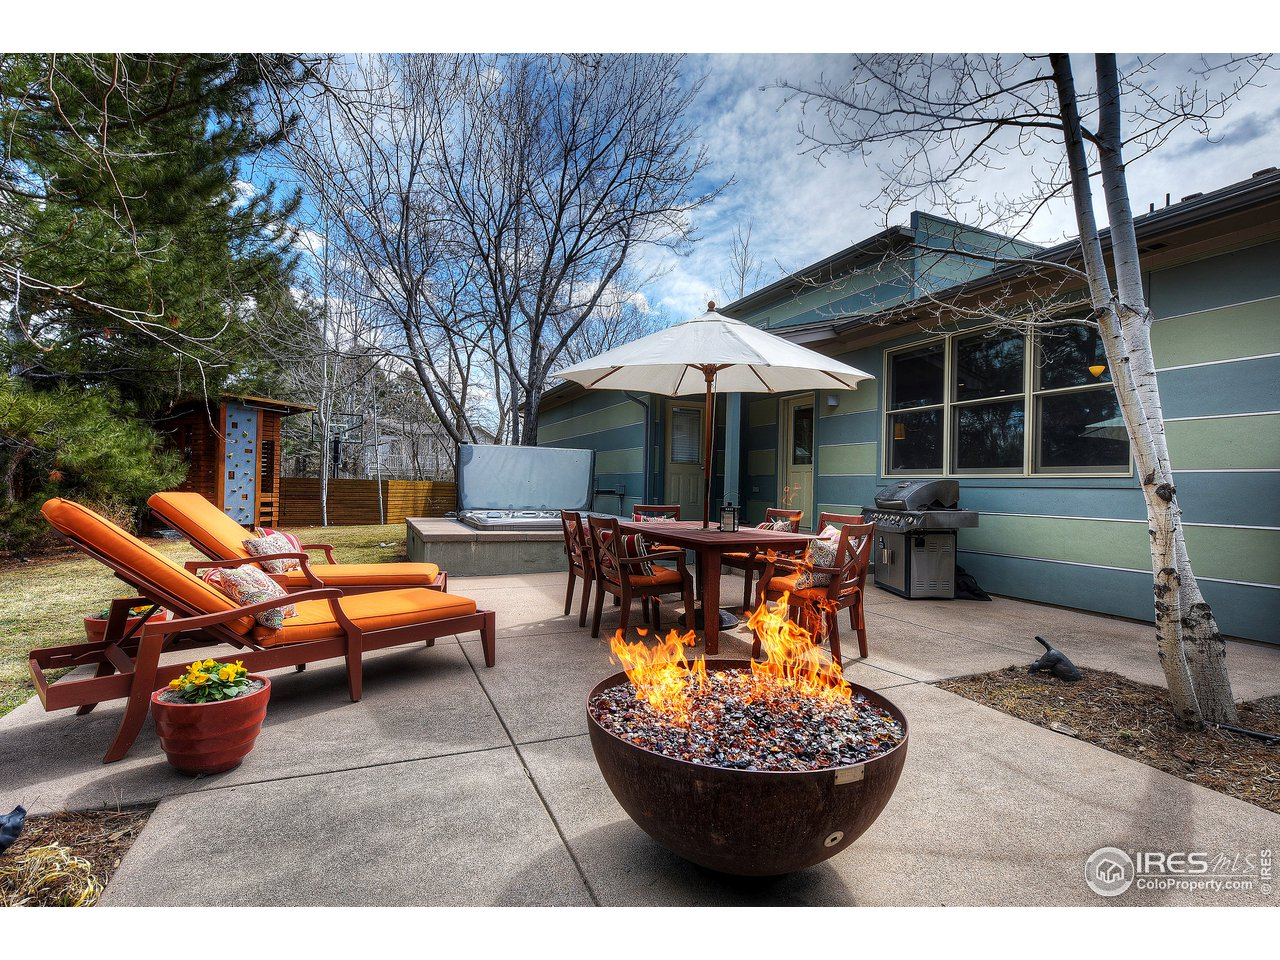 Elegant outdoor living area